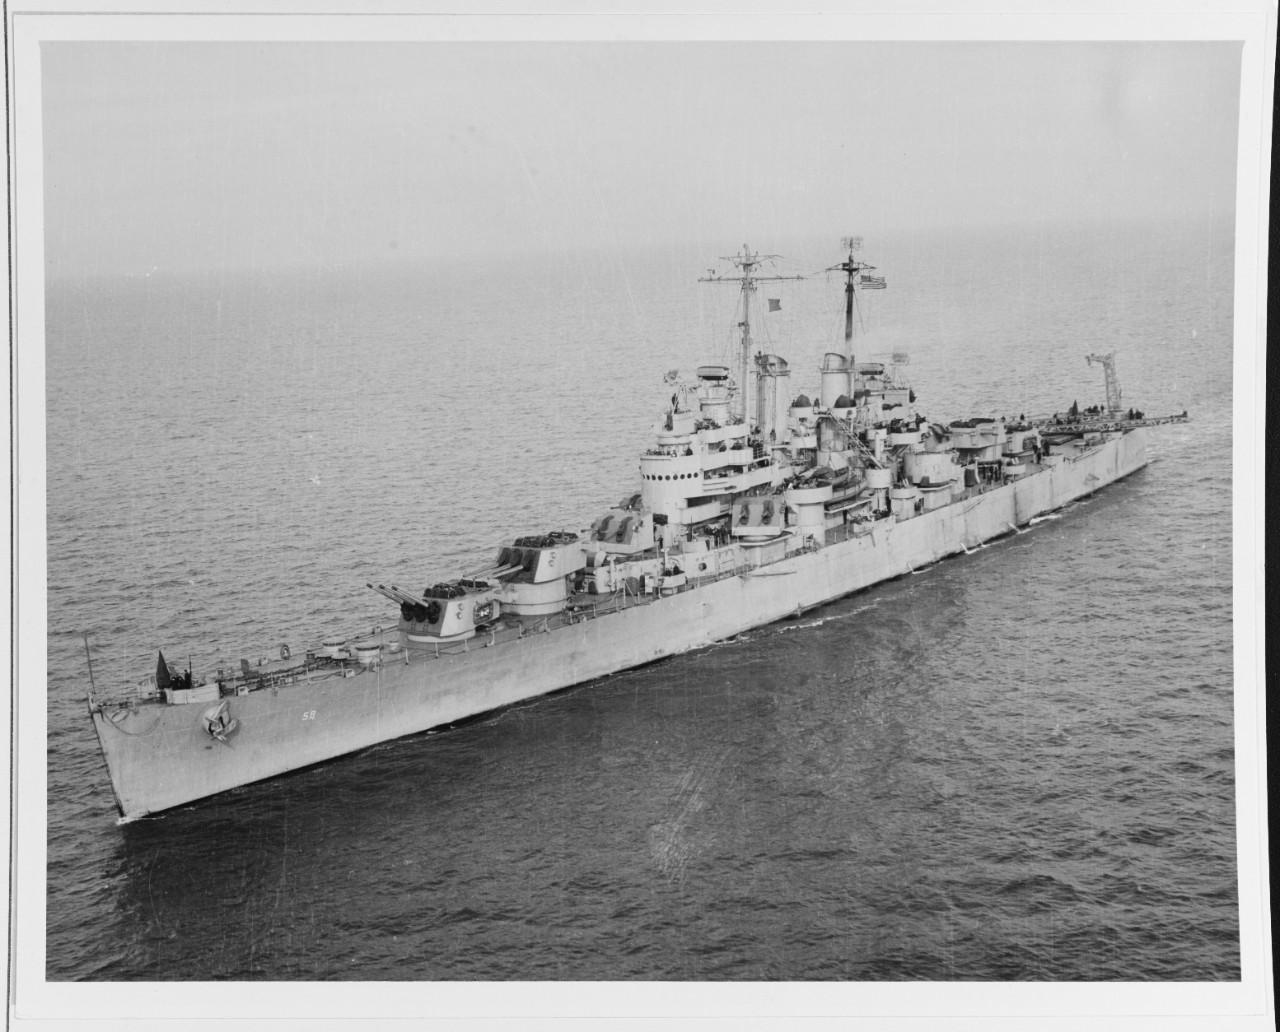 19-N-39431 USS Denver (CL-58